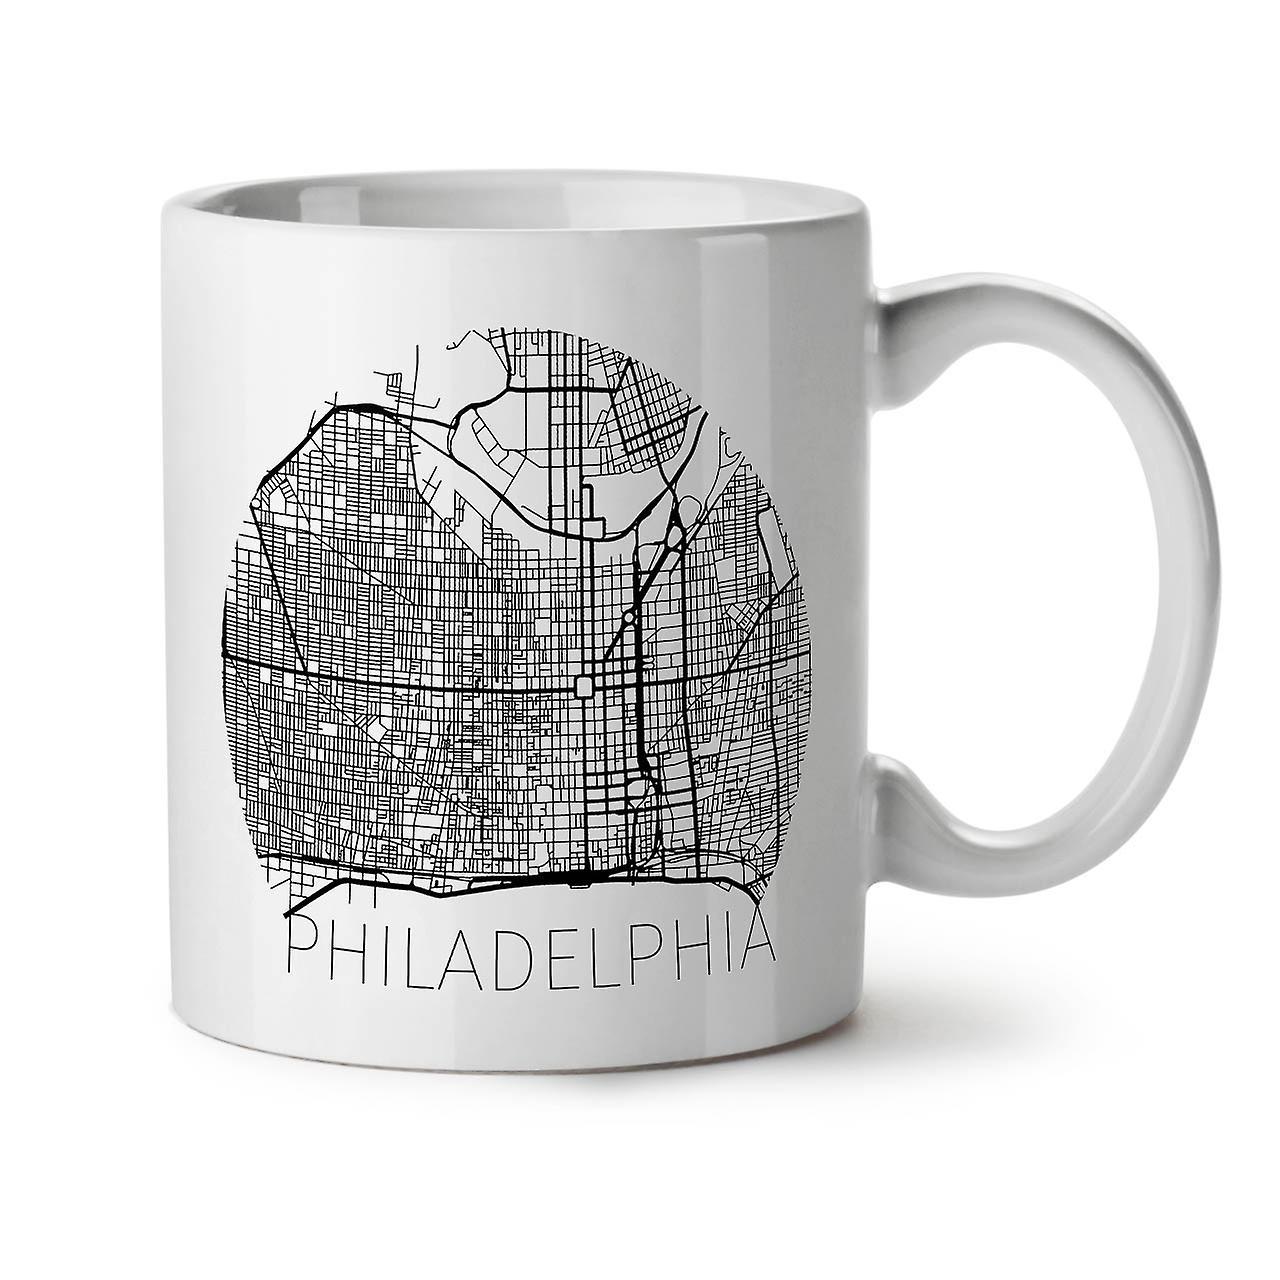 PhiladelphieVille Blanc 11 OzWellcoda Tasse Café Thé Nouvel Céramique 53qj4ARLc